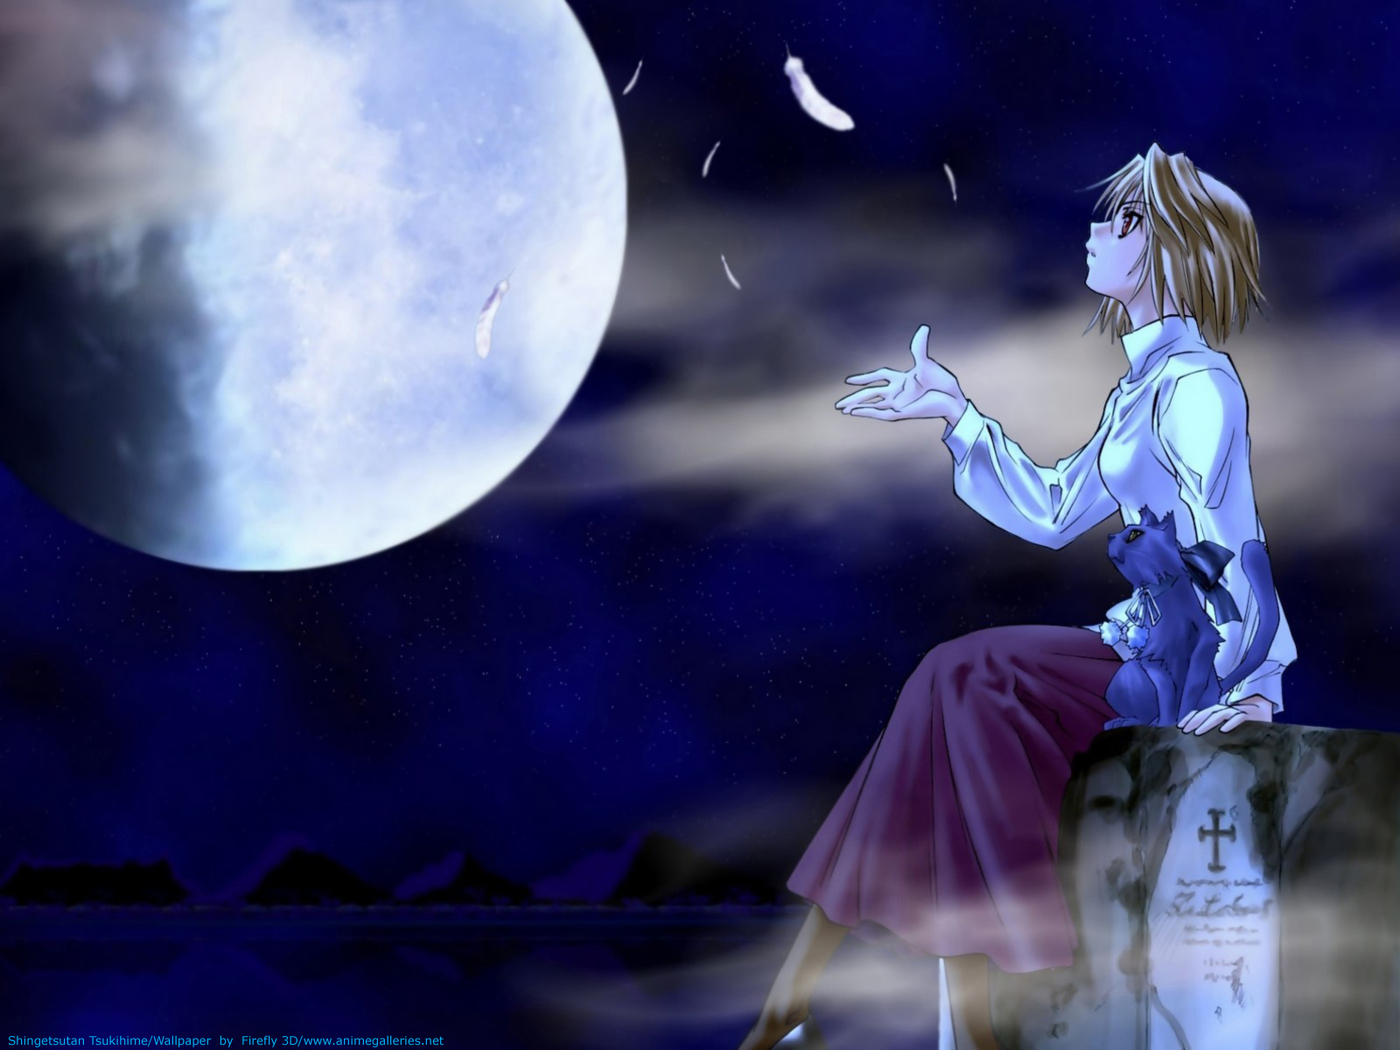 Tsukihime - Lunar Legend Anime Wallpaper # 4